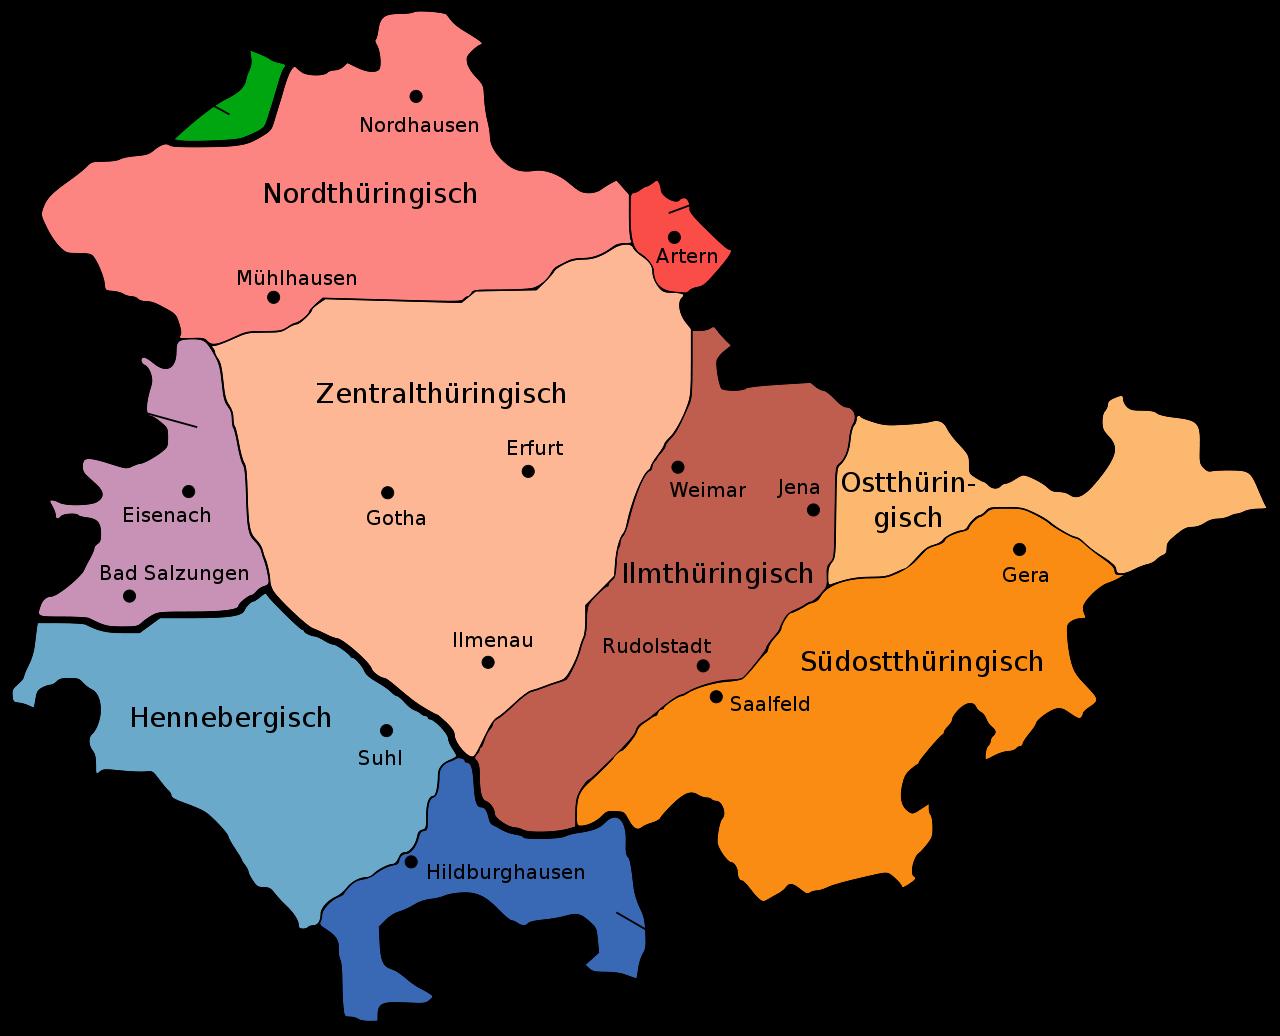 Ilmthuringisch Wikipedia Thuringen Jena Weimar